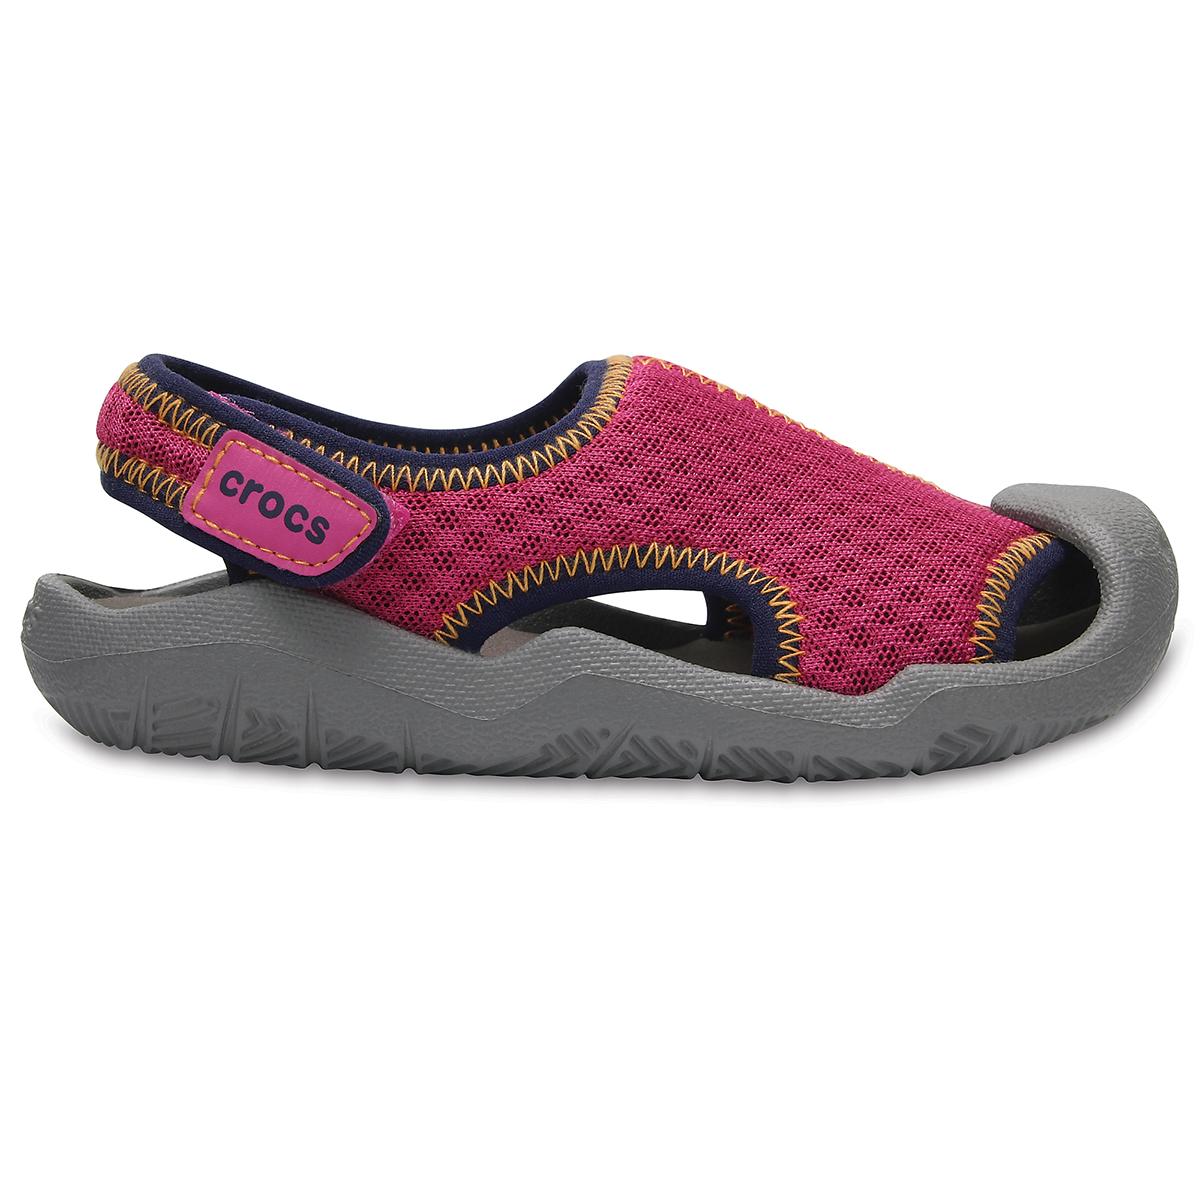 Crocs Swiftwater Sandal K - Neon Pembe/Duman